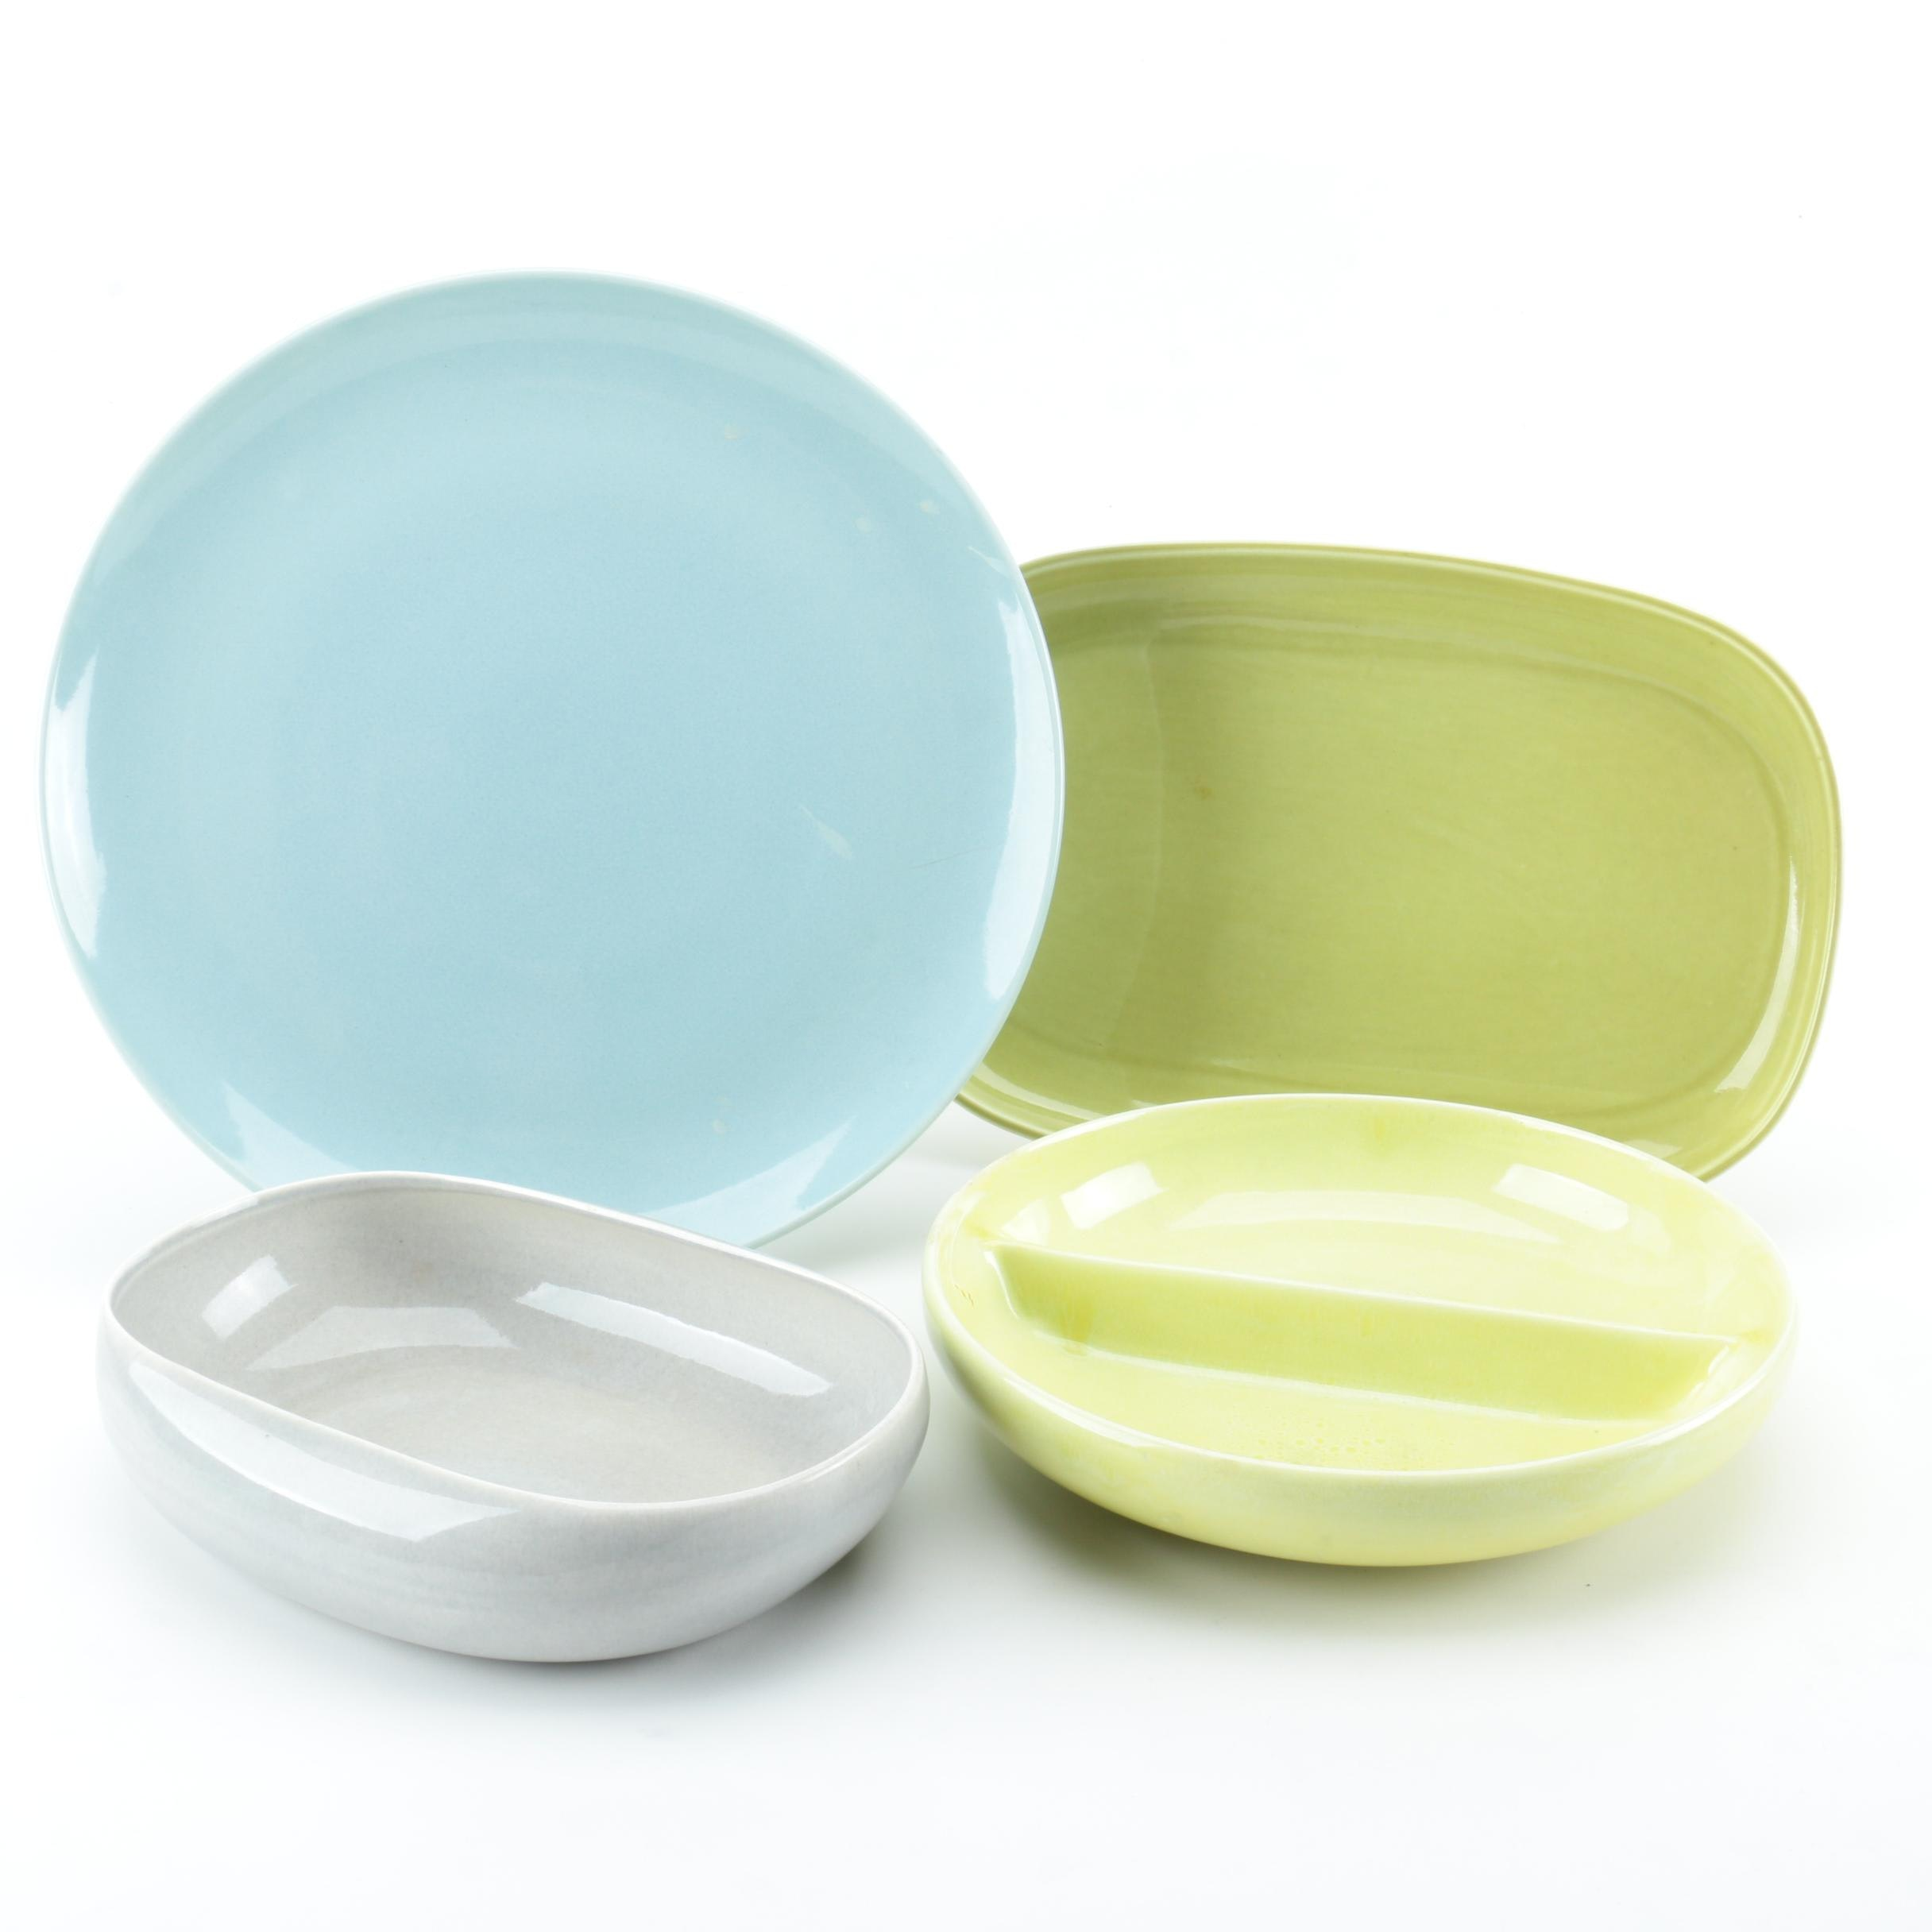 Mid Century Modern Russel Wright Ceramic Tableware Assortment